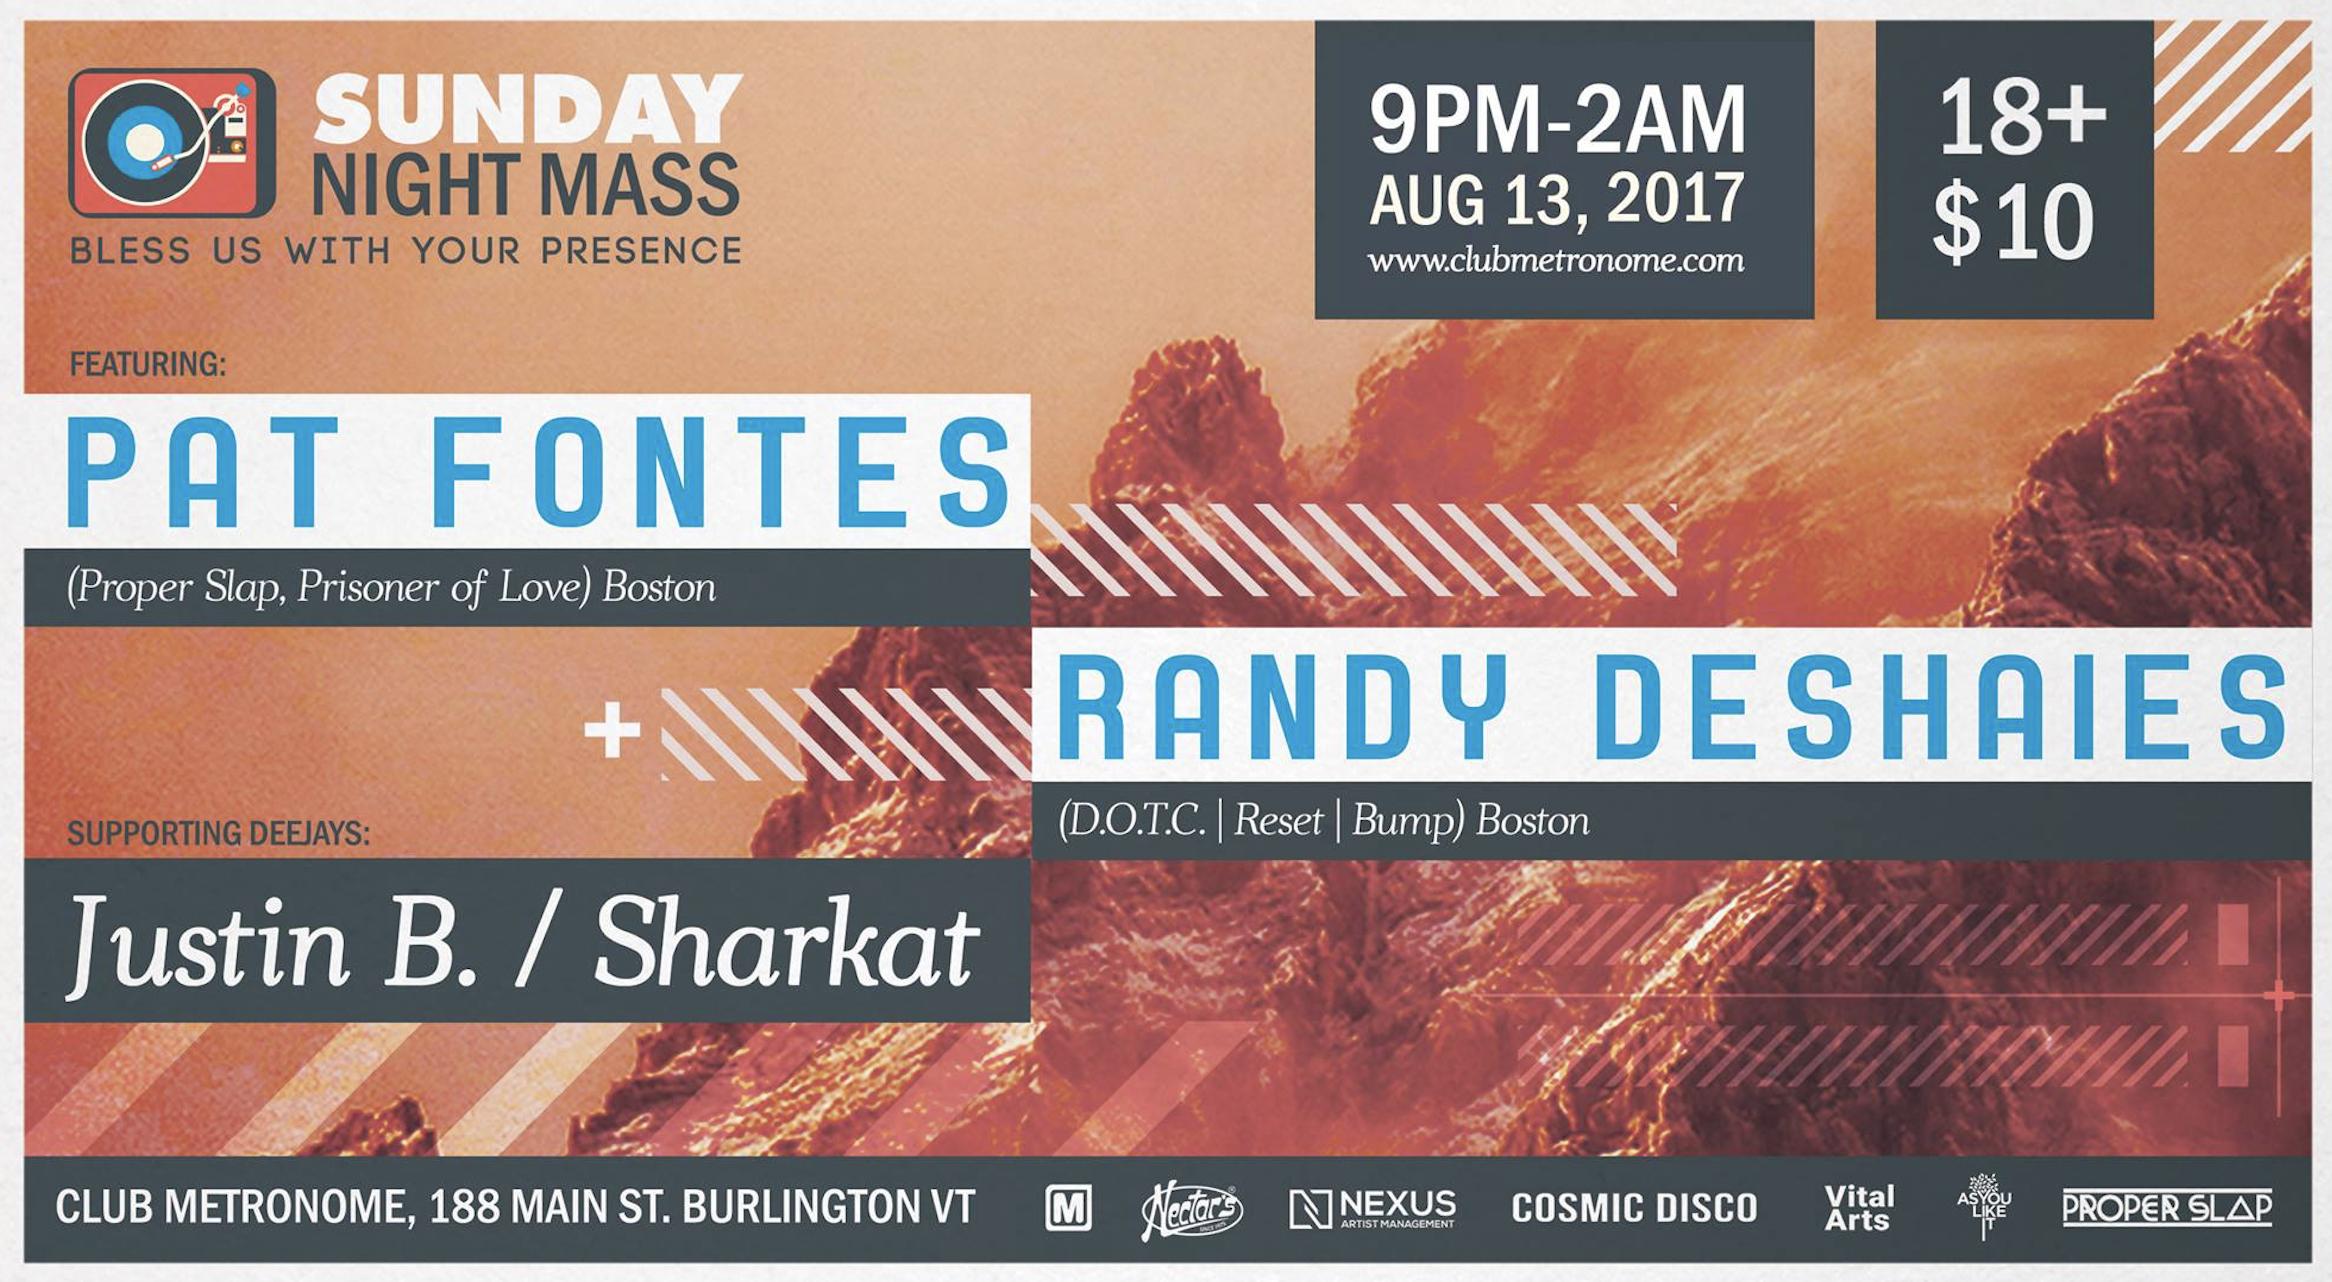 Artwork for Sunday Night Mass this Sunday, August 13, 2017